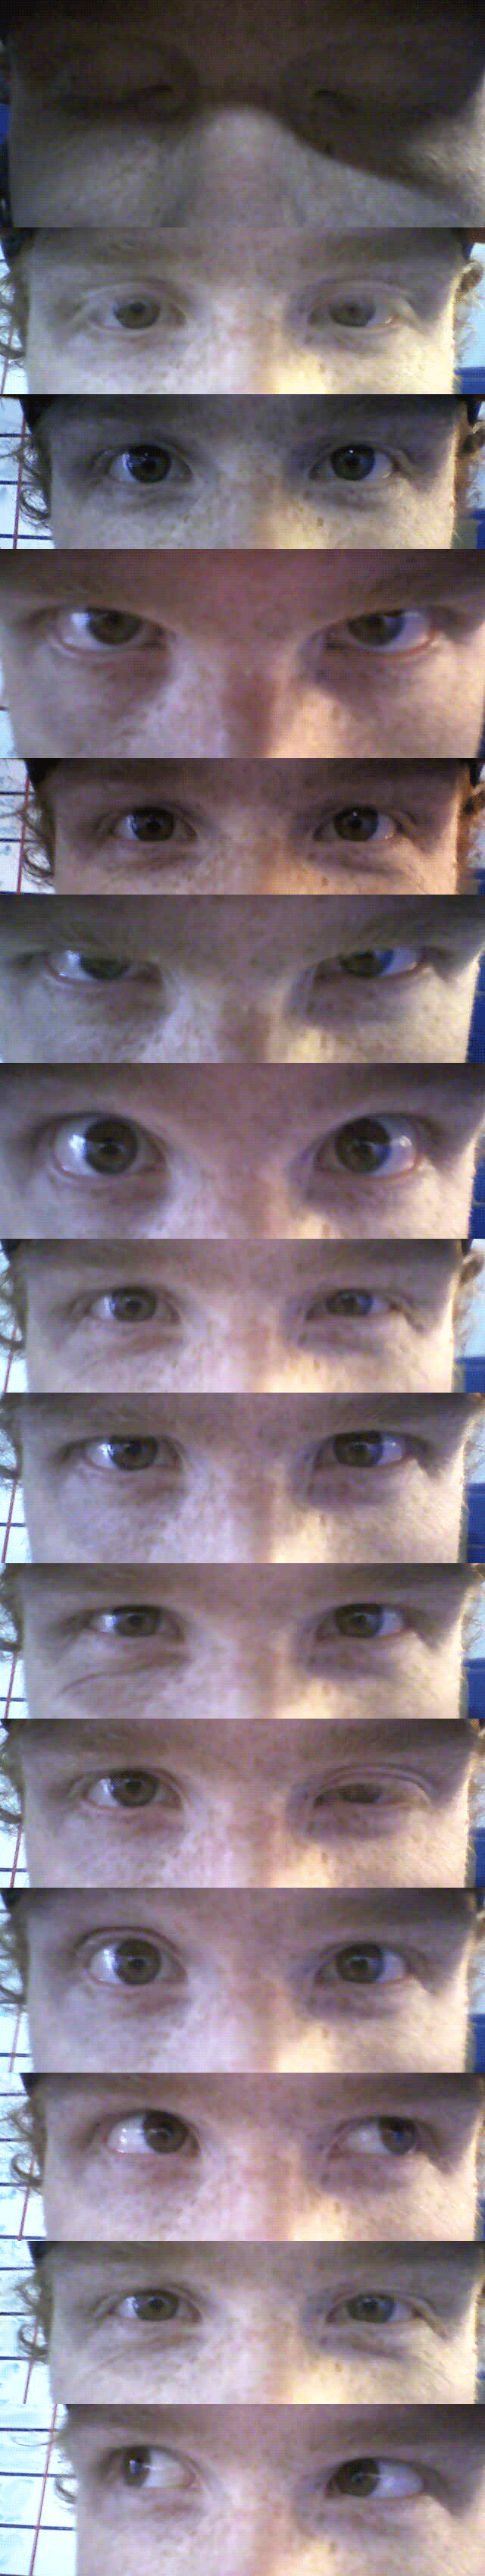 eye-study-reference